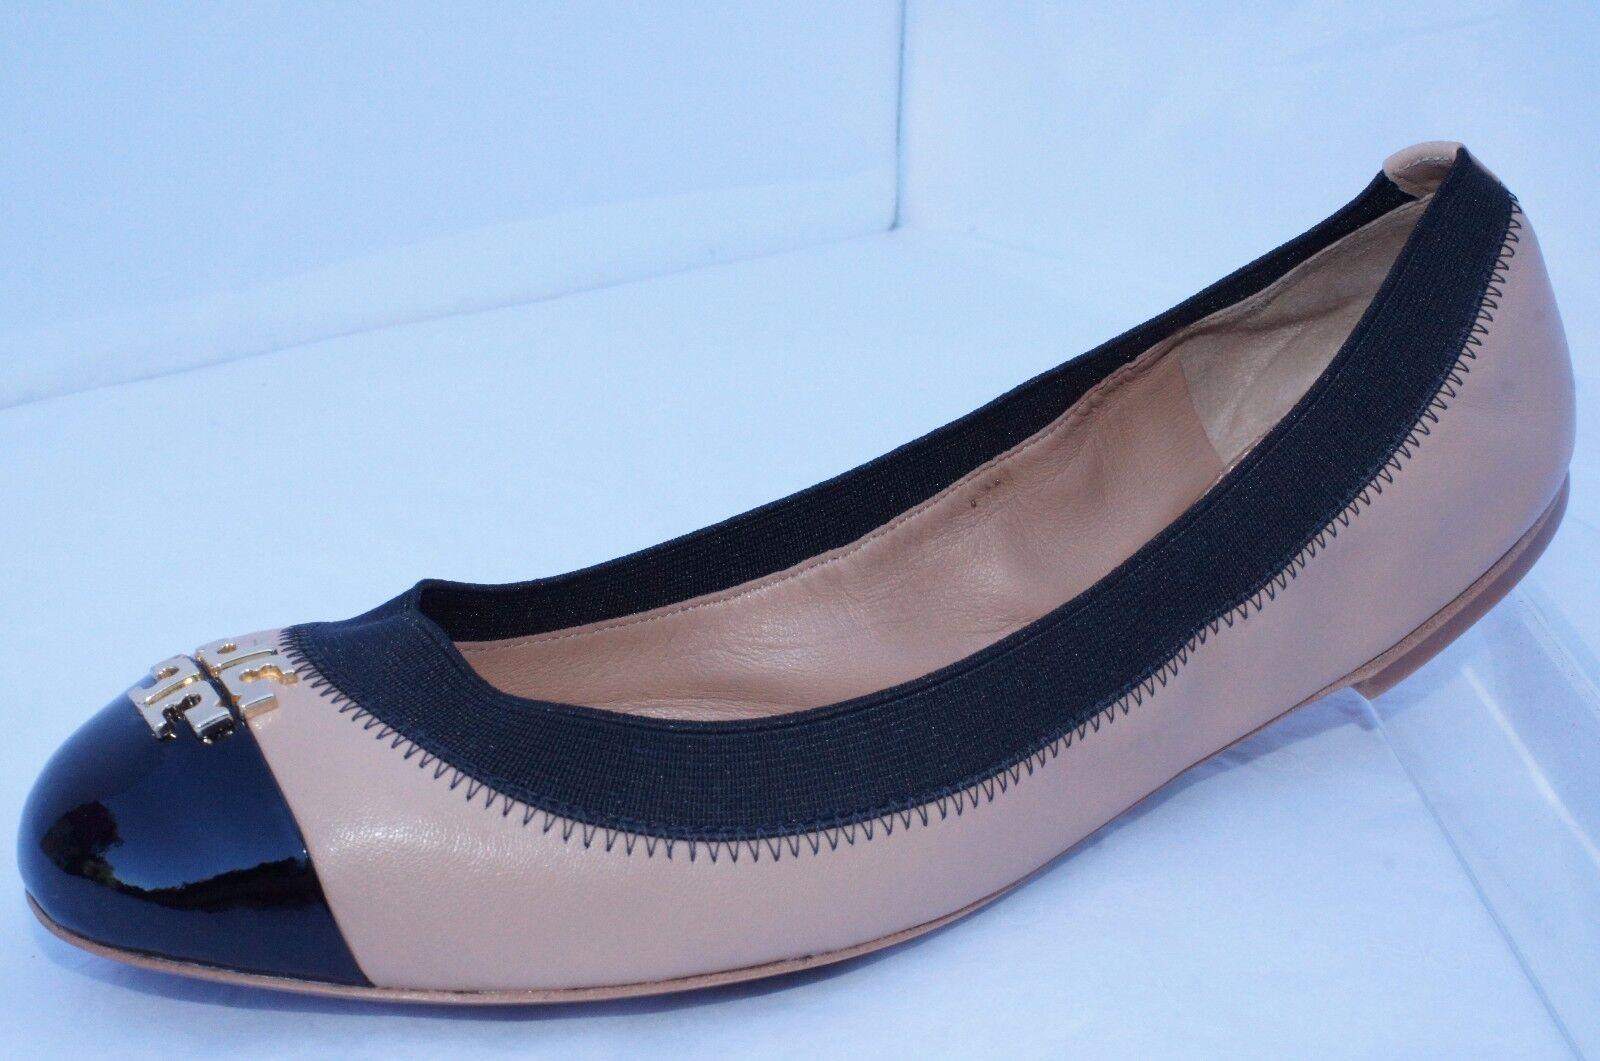 New Tory Burch Jolie shoes Ballet Flats Beigi Size 7.5 Sale Leather Gift